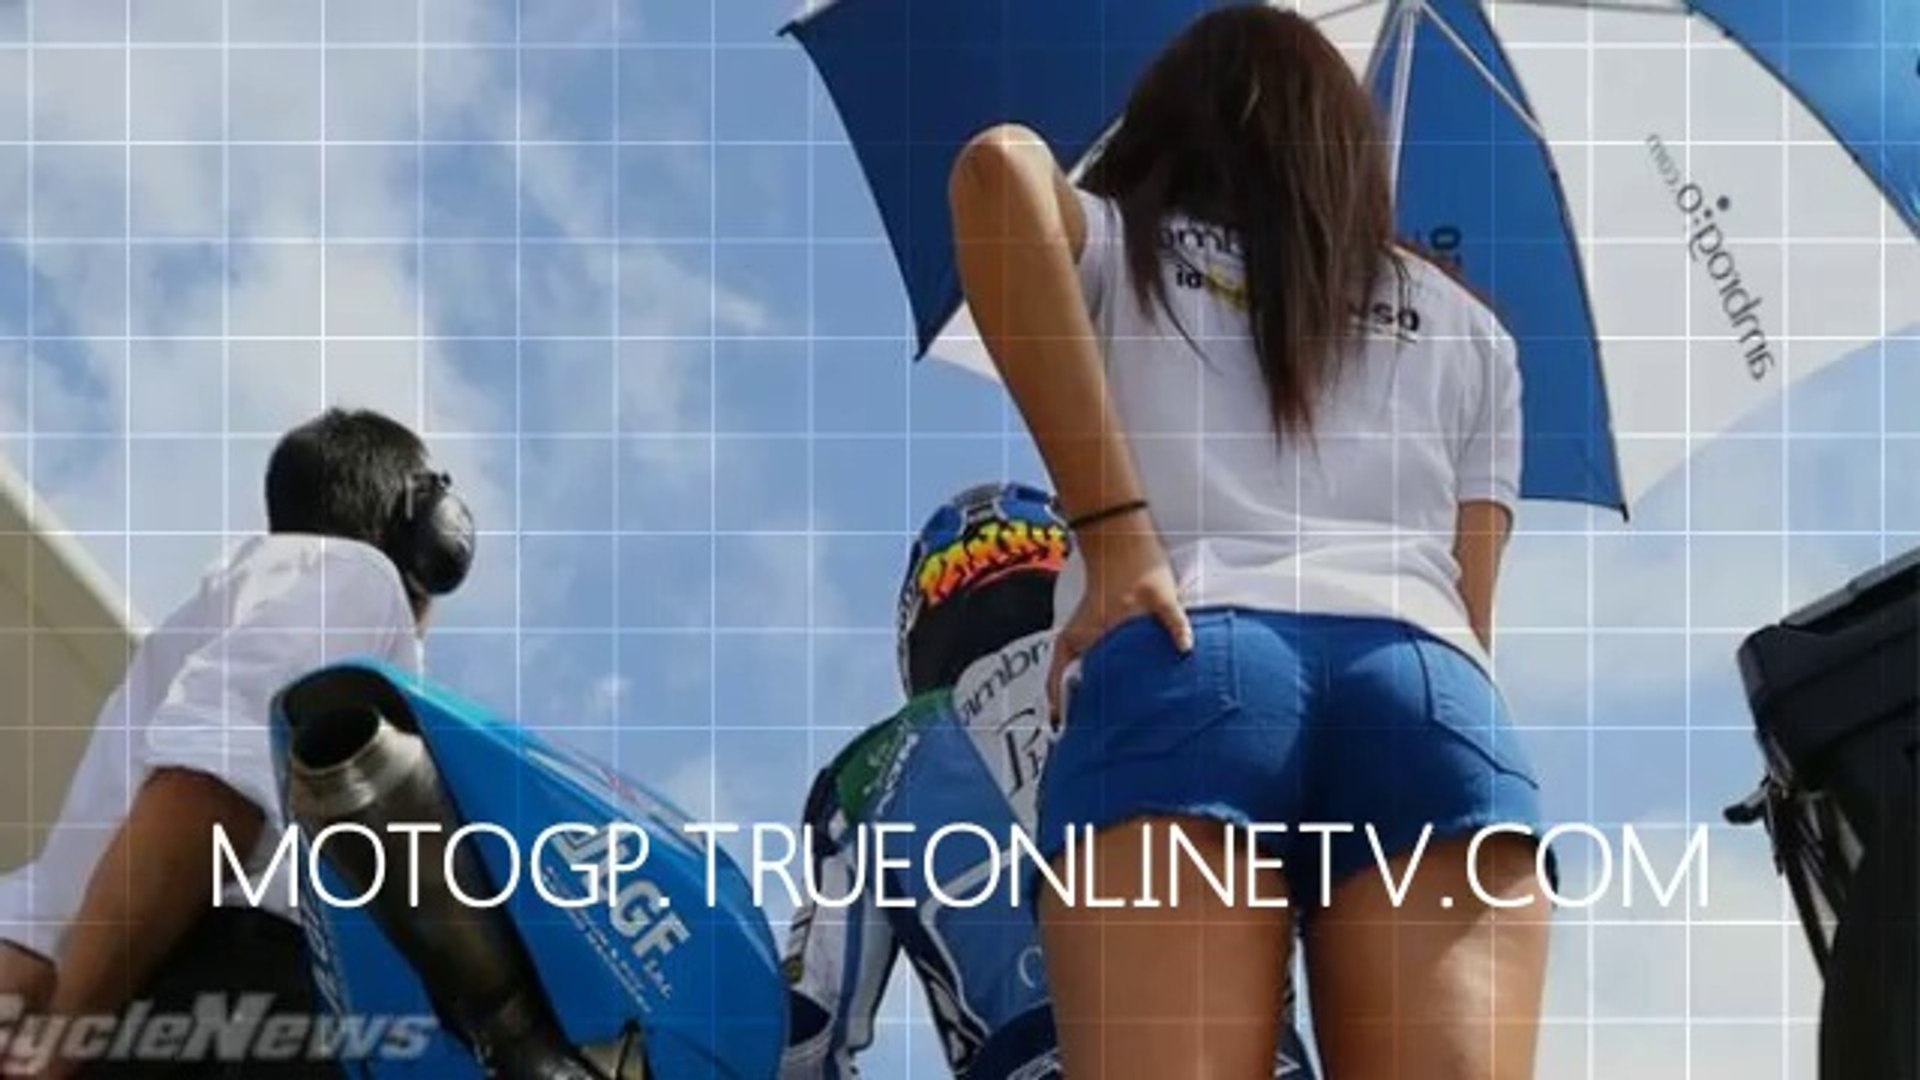 Watch qatar 2014 events - live Motogp streaming - qatar losail - moto grand prix